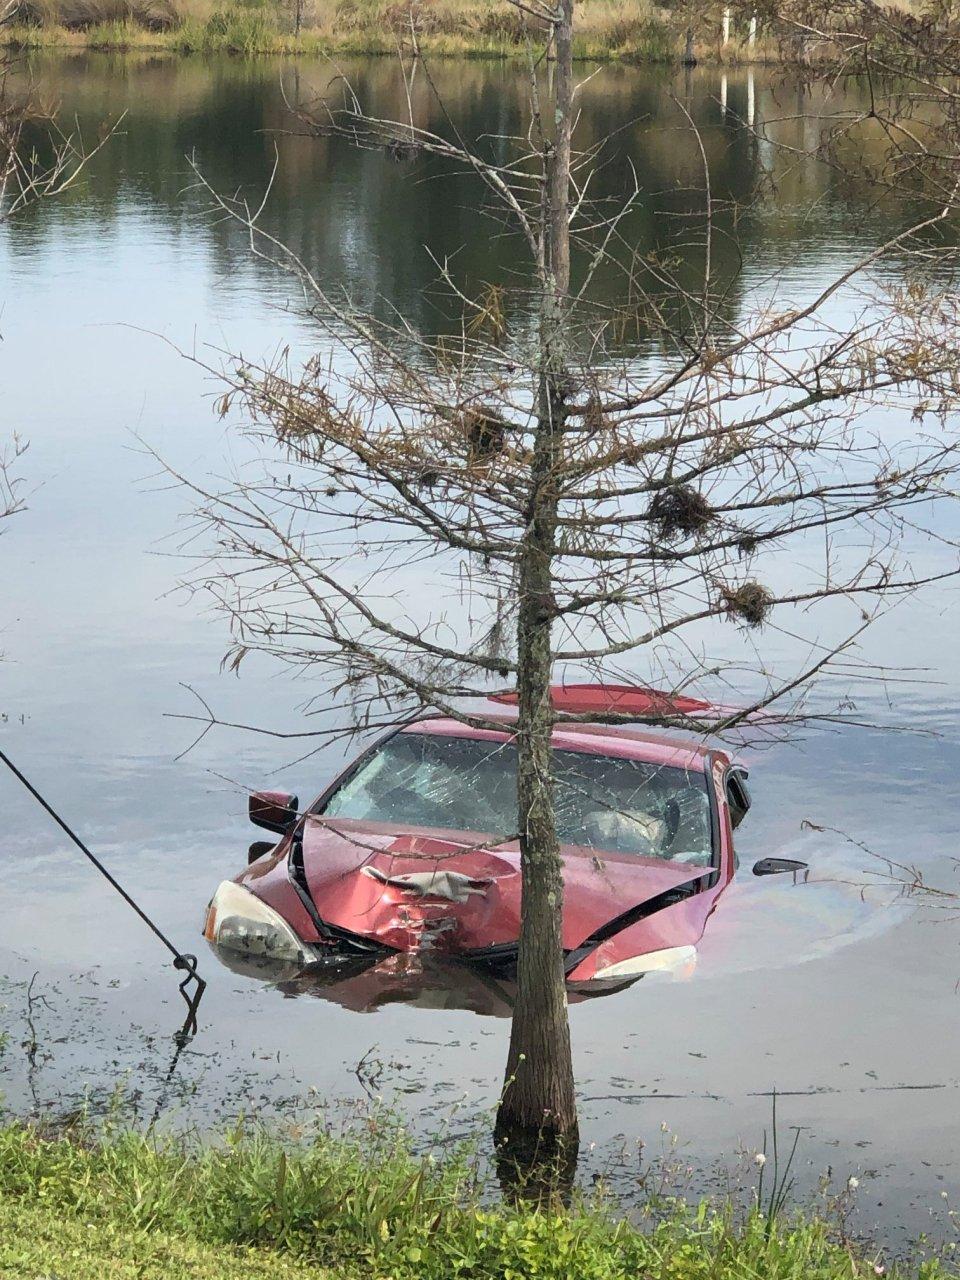 Two good Samaritans rescue driver